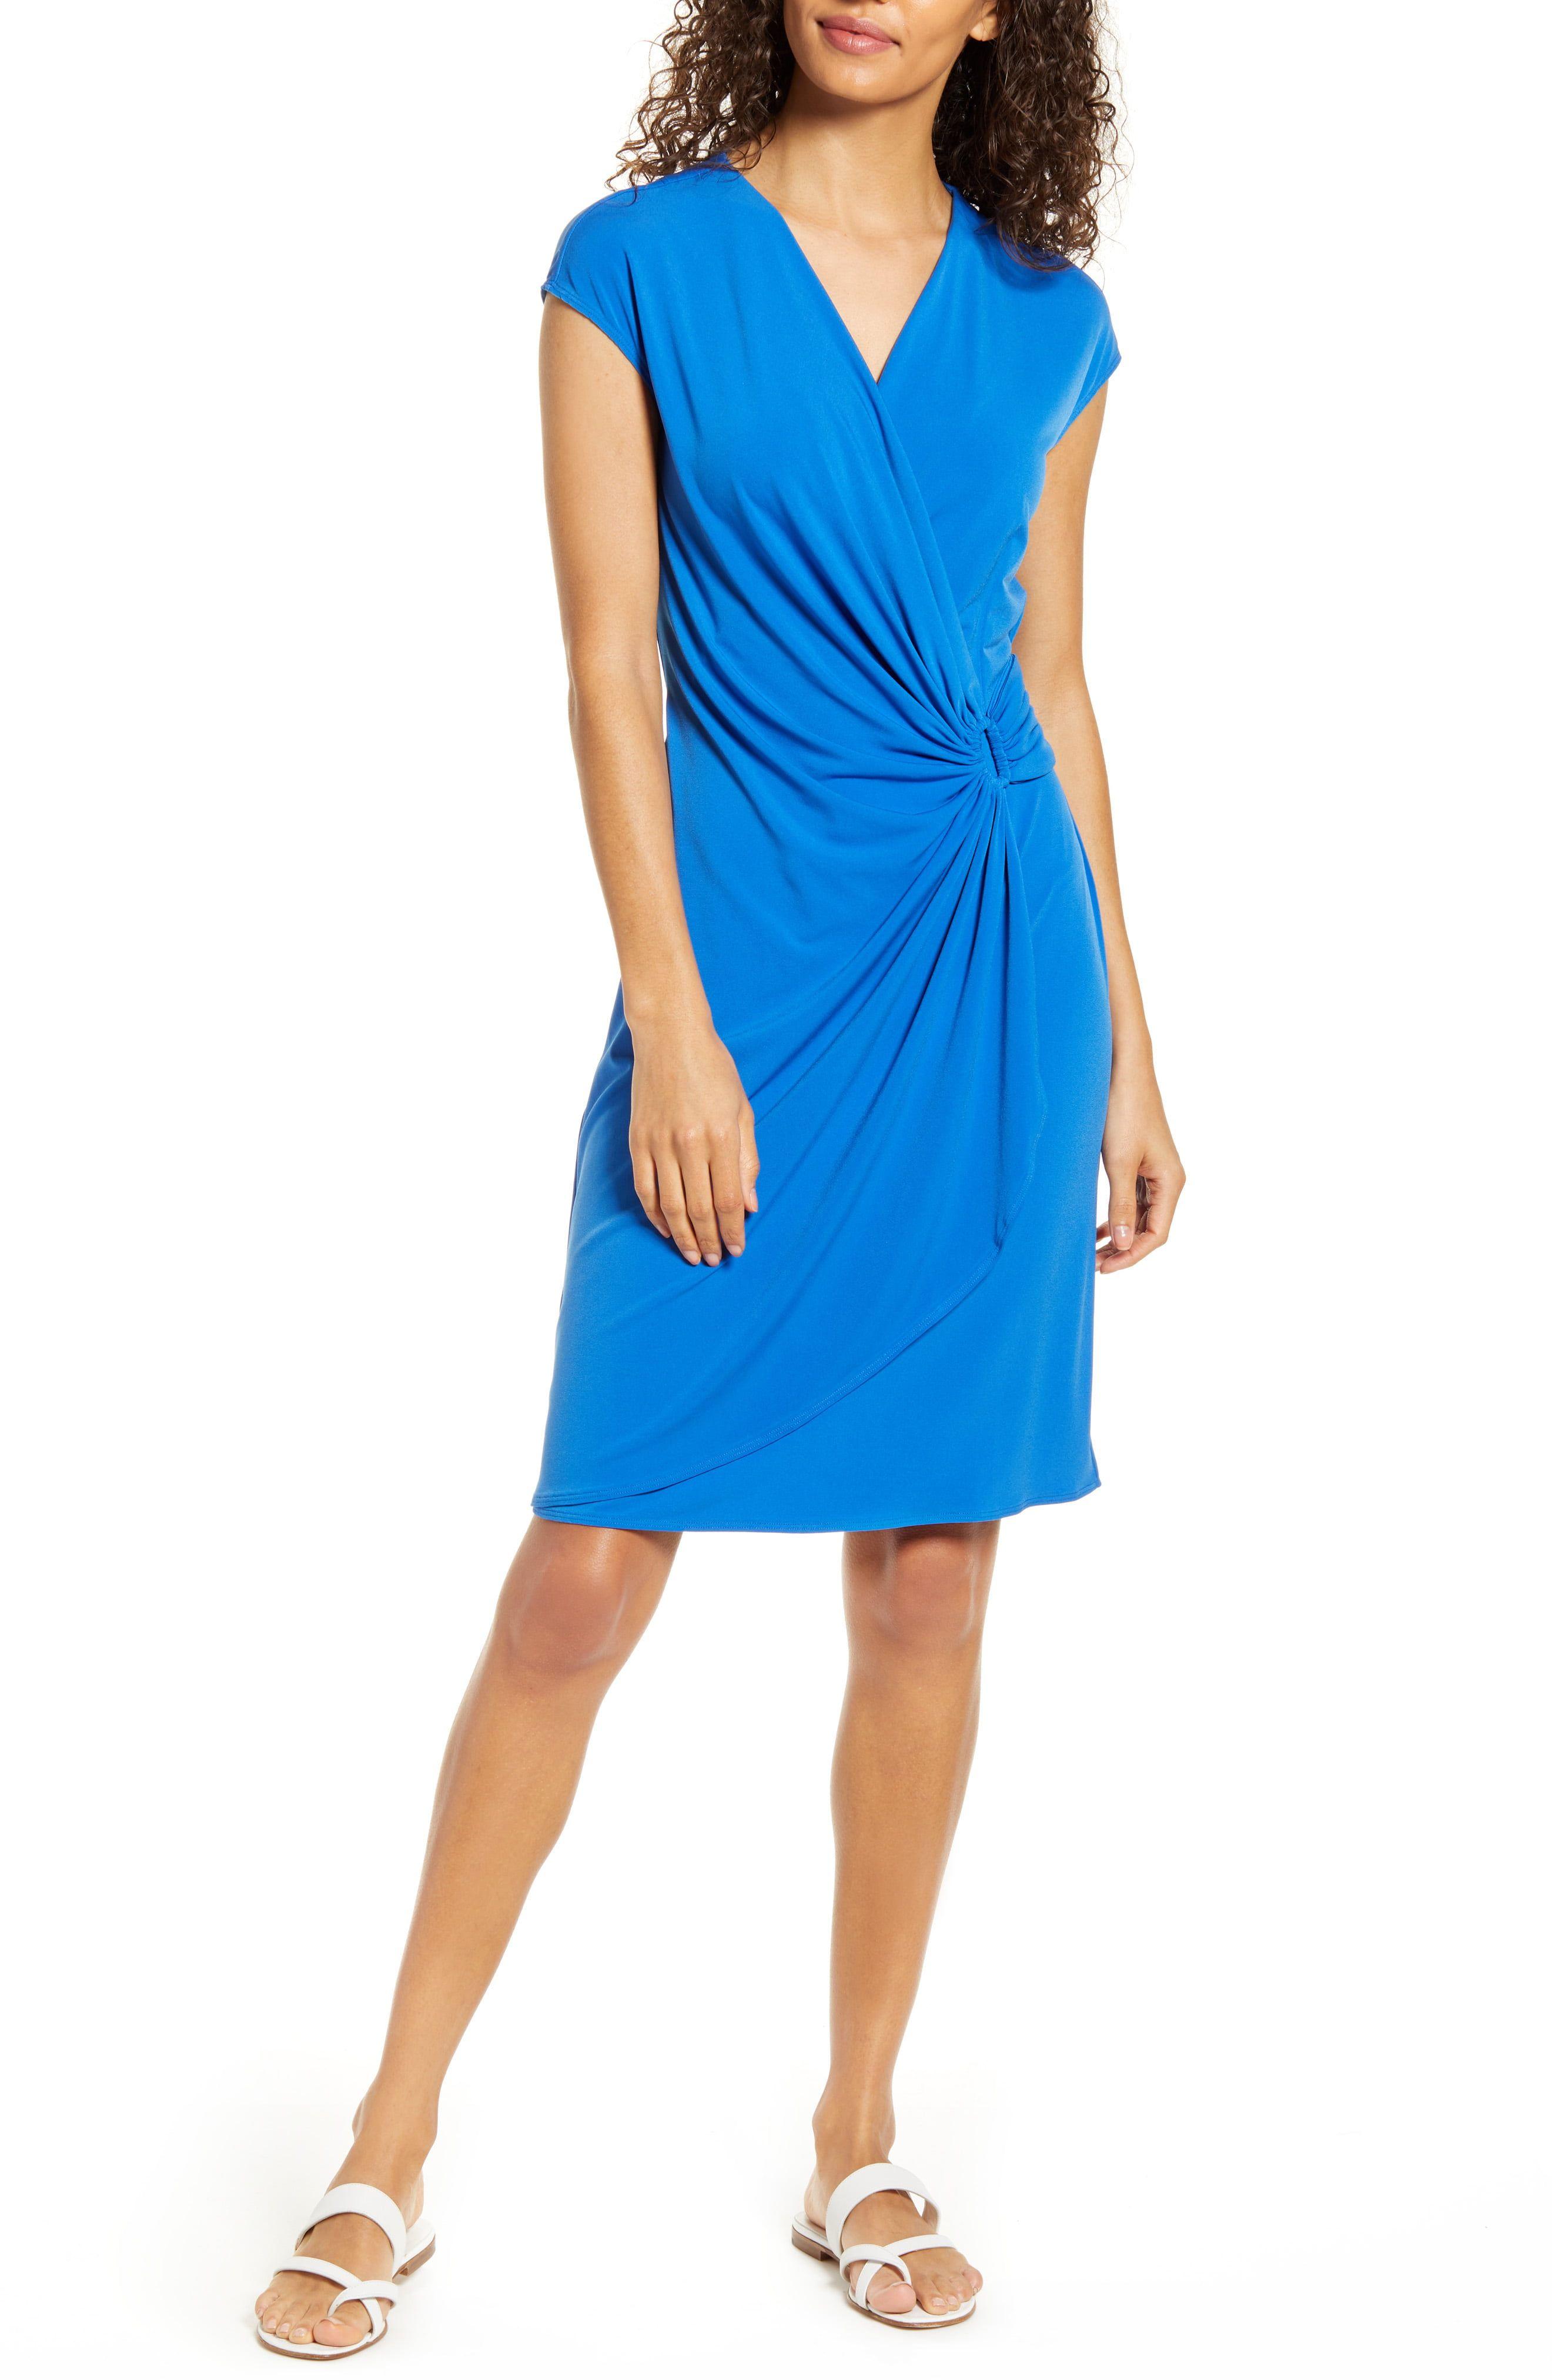 Tommy Bahama Carmela Faux Wrap Dress Nordstrom Wrap Dress Faux Wrap Dress Tommy Bahama Dress [ 4048 x 2640 Pixel ]